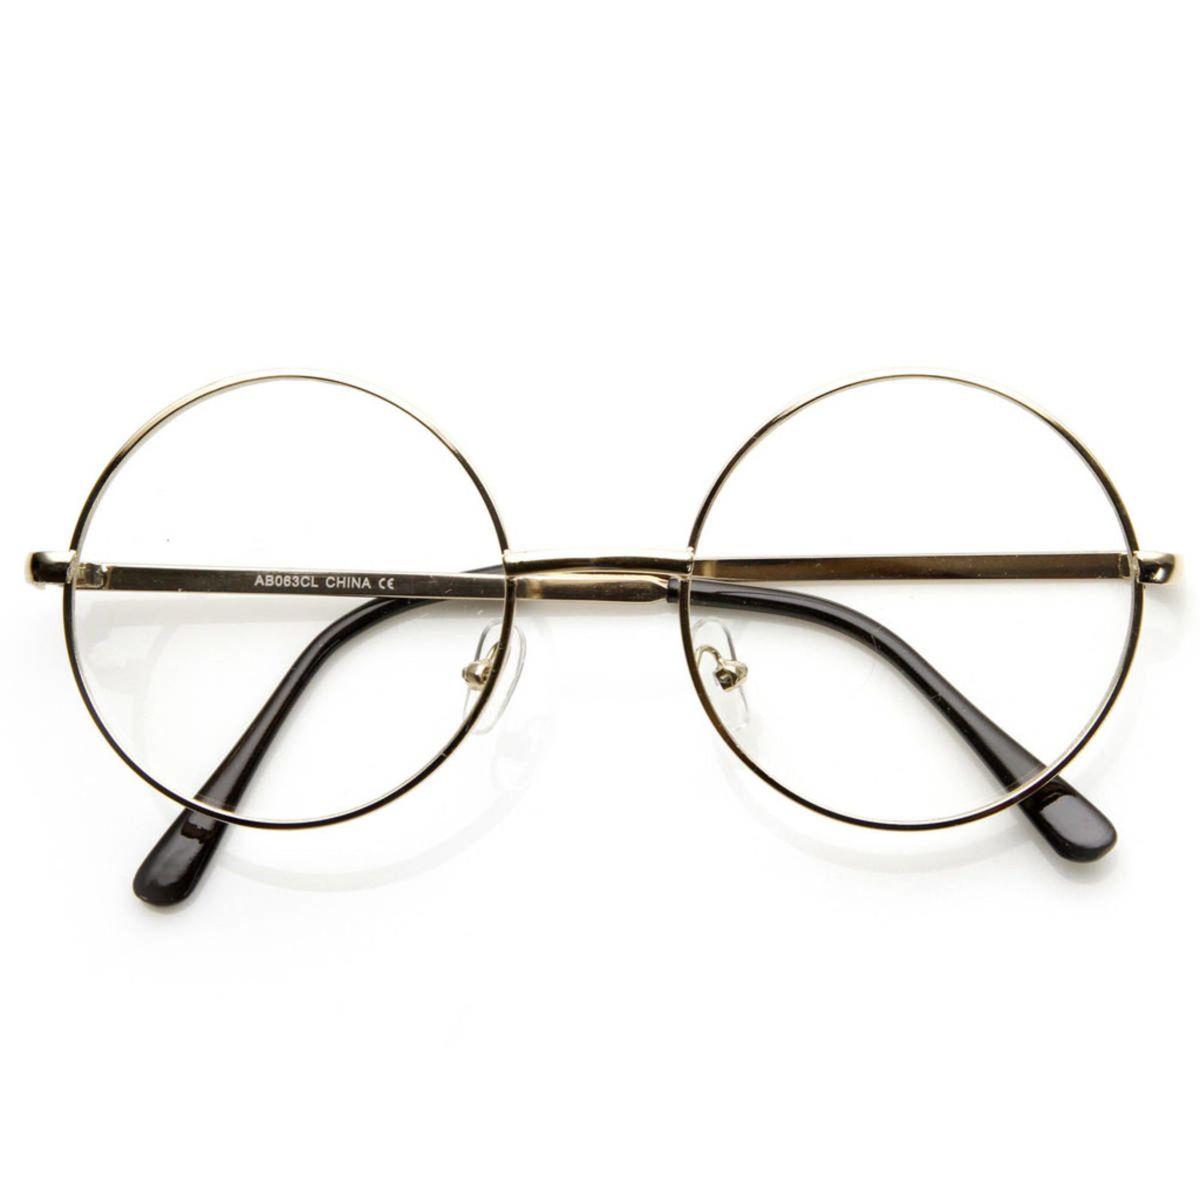 f5a927753a531 Óculos Redondo - Harry Potter - John Lennon